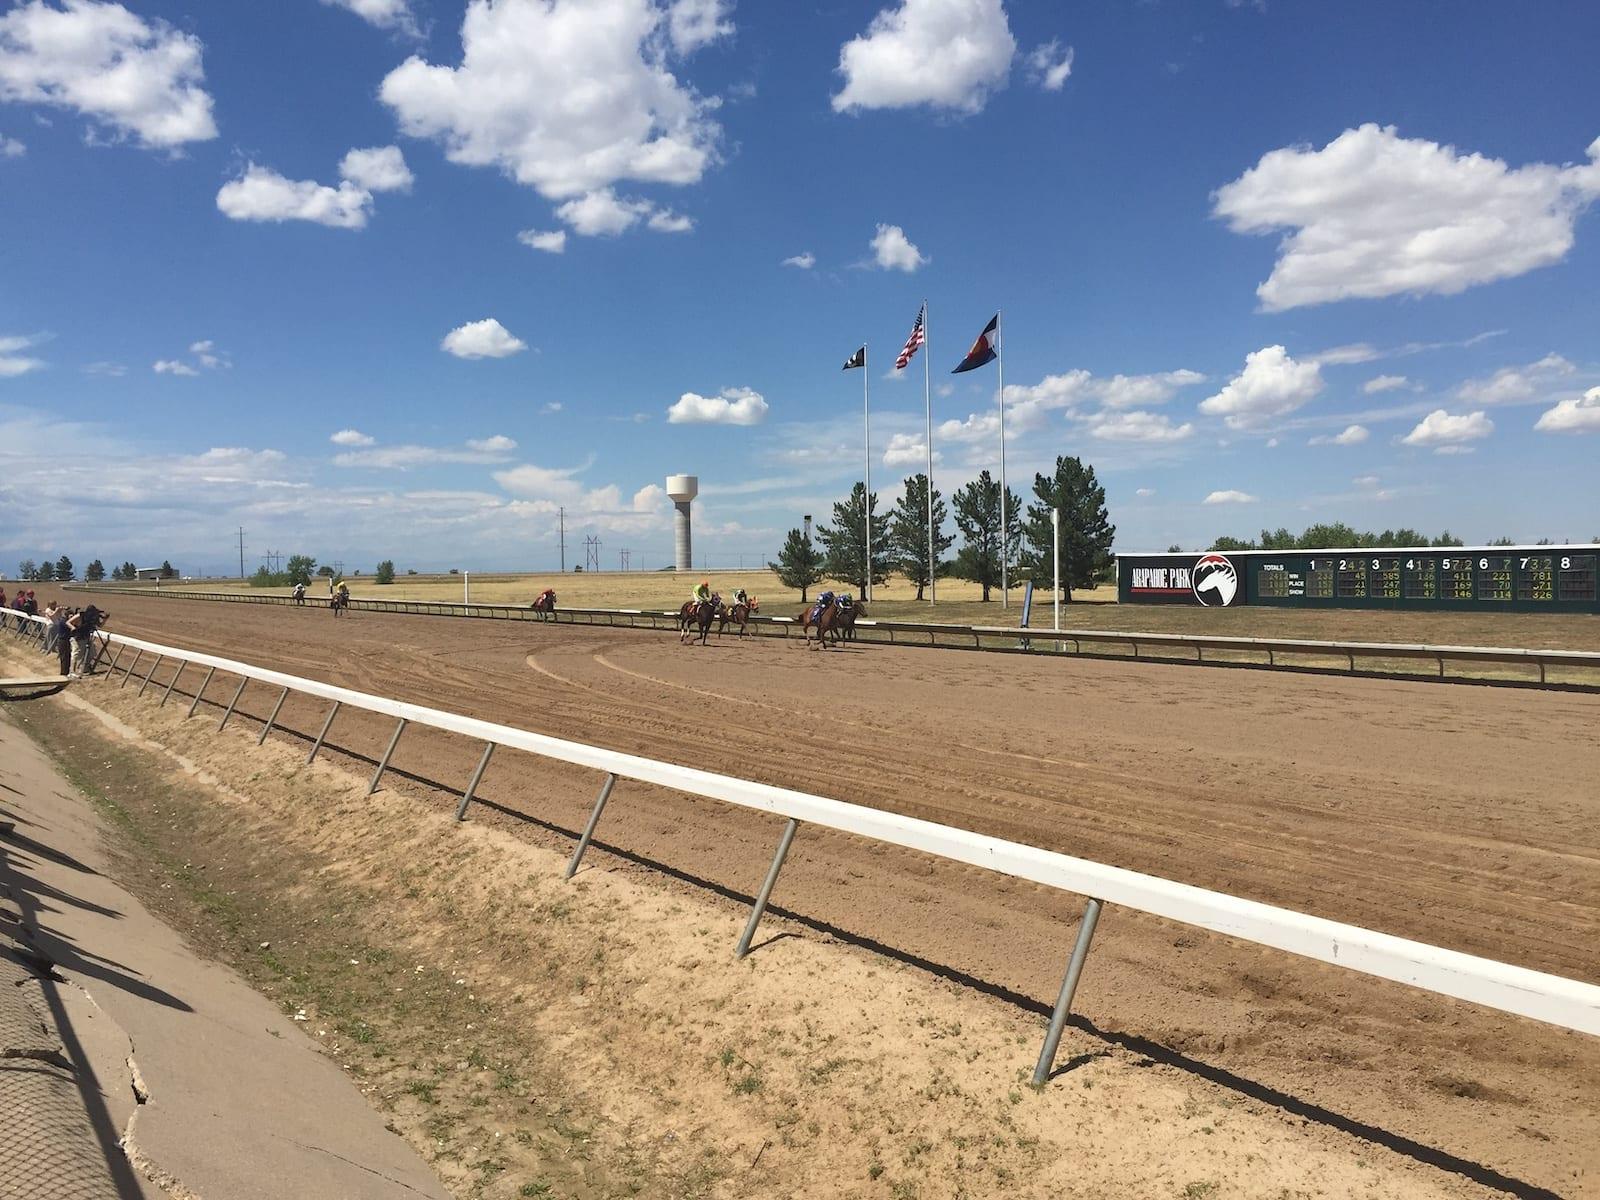 Horse Racing Arapahoe Park Racetrack Final Straightaway